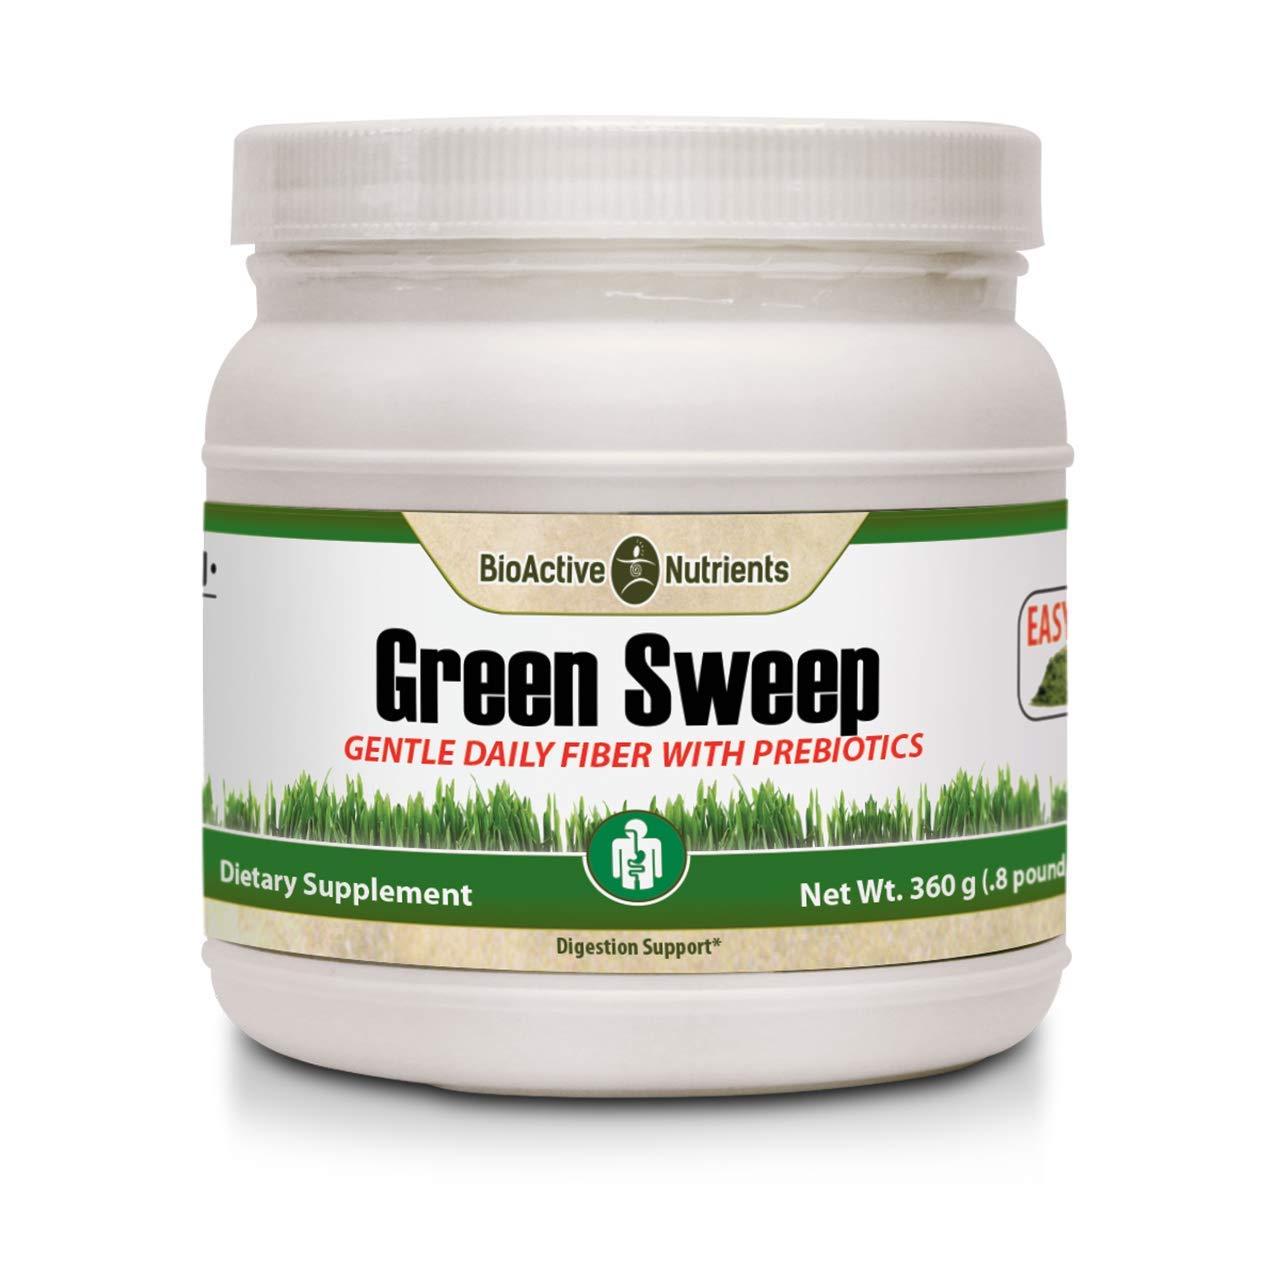 Green Sweep Fiber with Prebiotics by BioActive Nutrients